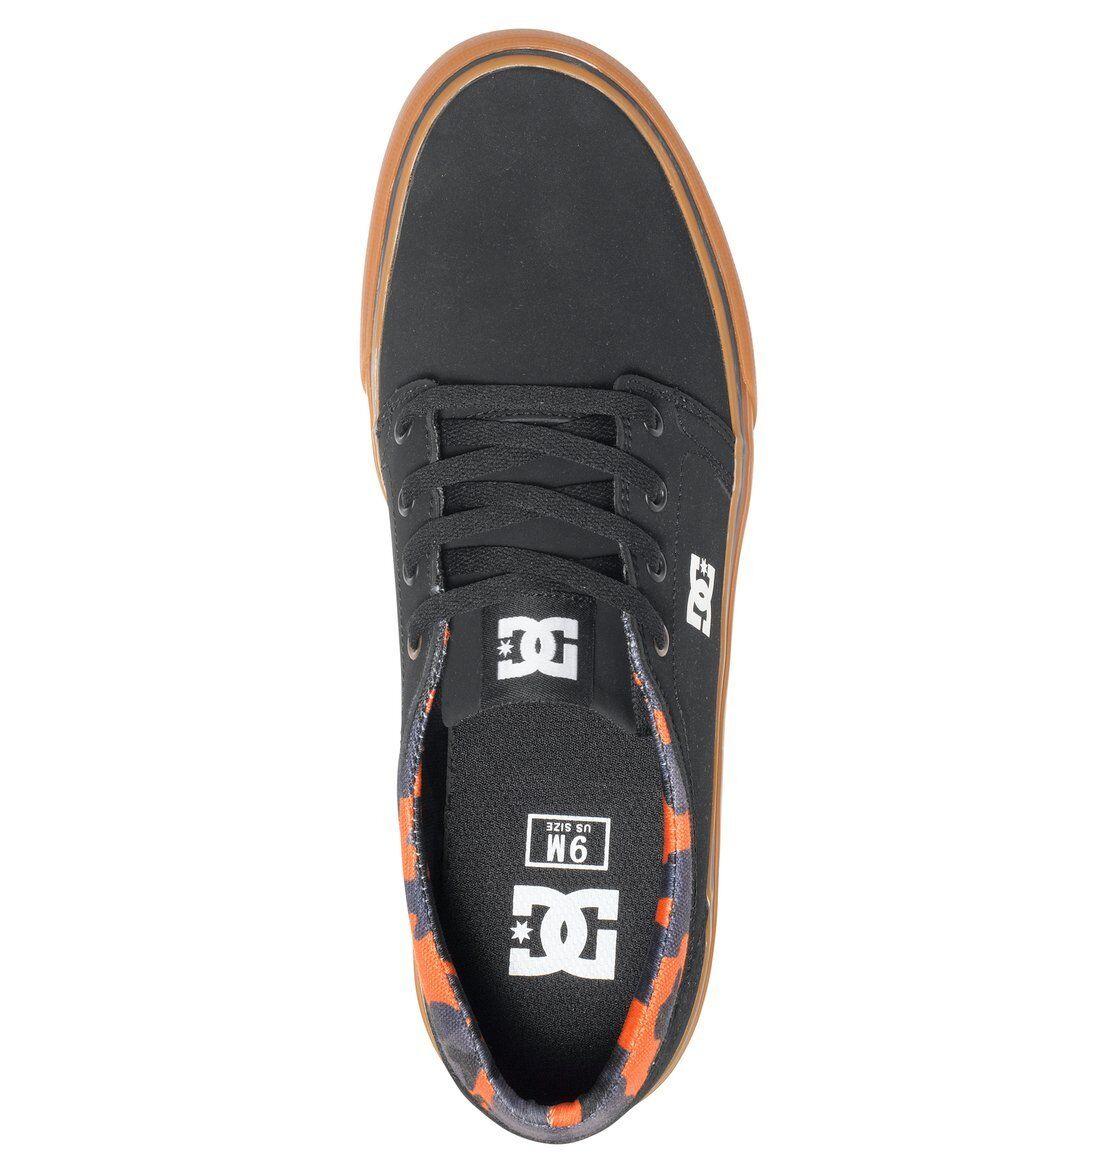 Herrenschuhe Herlings skate DC Schuhe trase j. Herlings Herrenschuhe black Schuhe chaussures zapatos d080d0